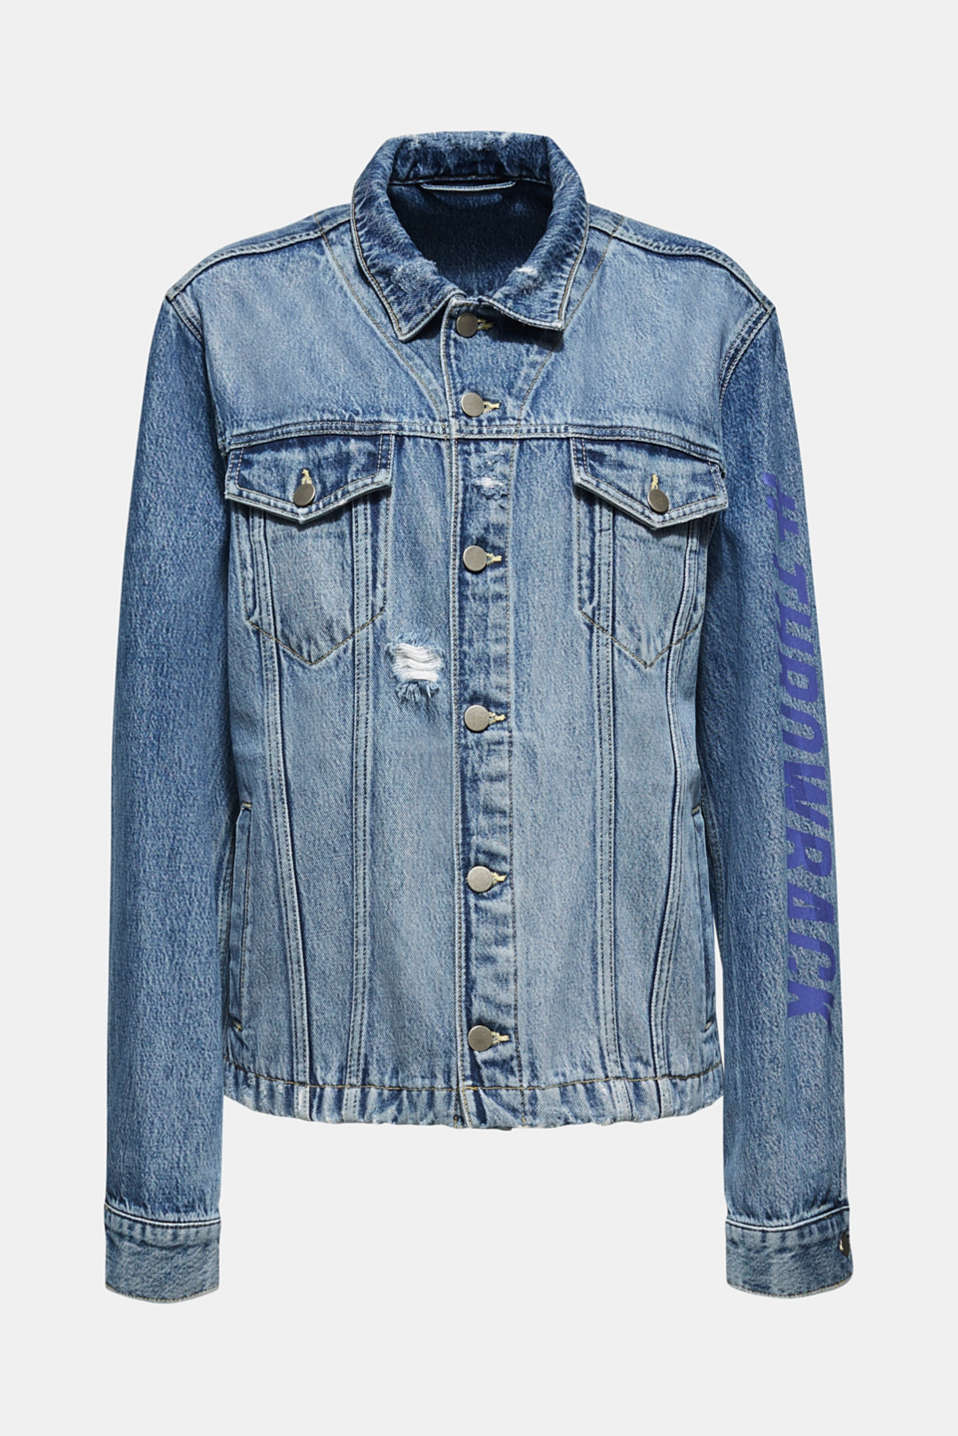 Jackets outdoor denim, BLUE MEDIUM WASH, detail image number 6